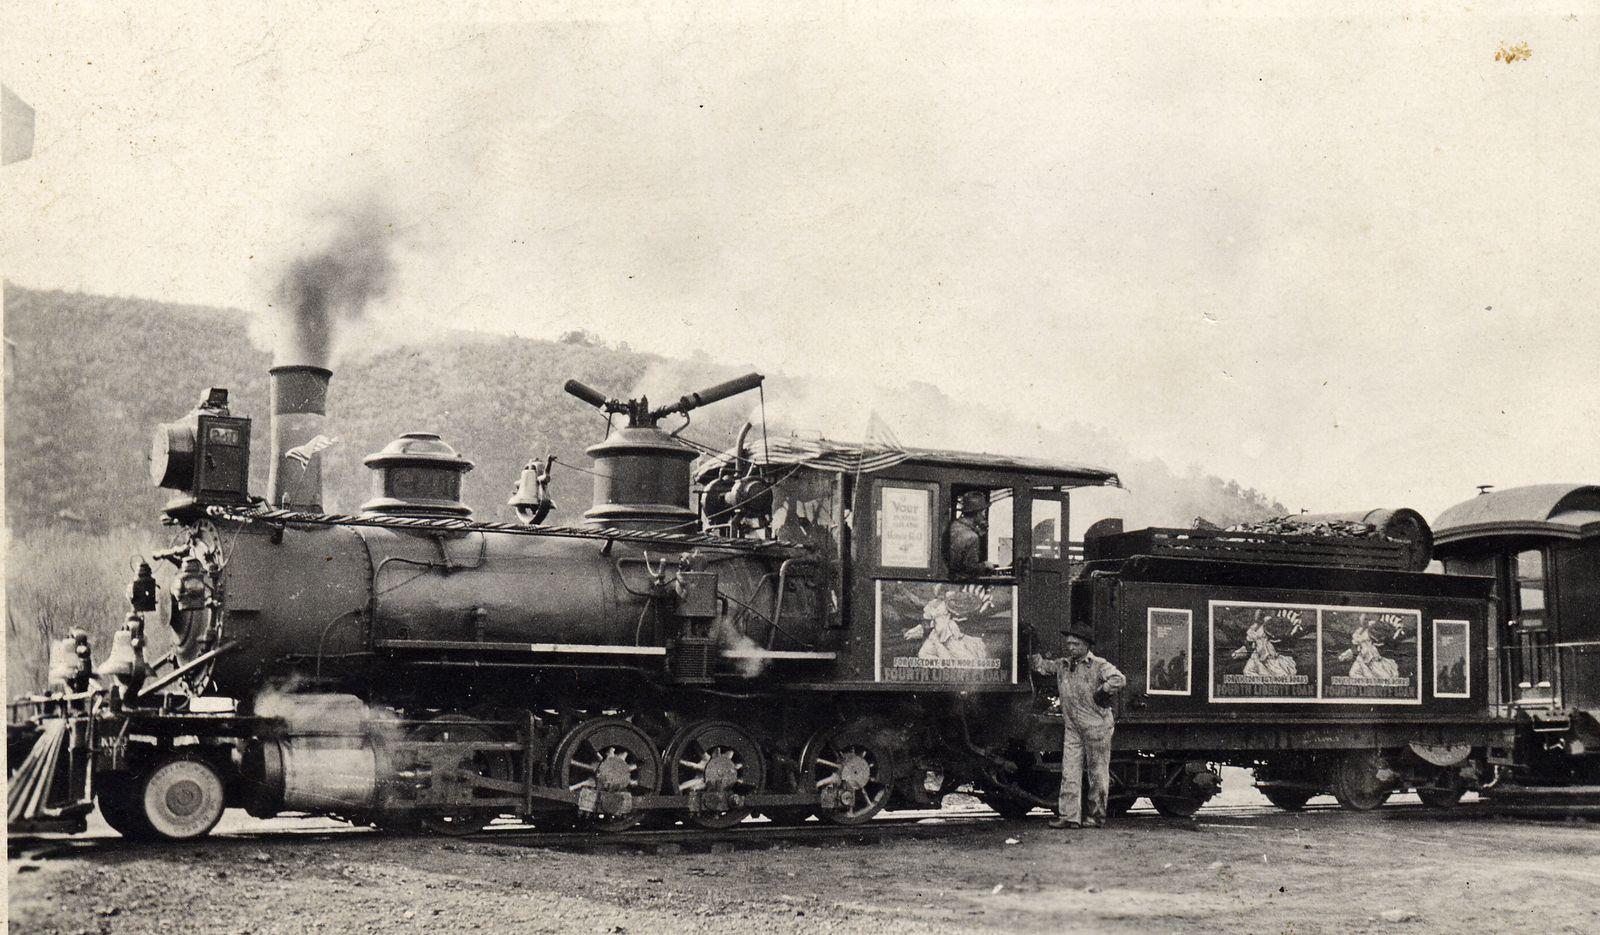 Photo: #240 Bond Selling Train, Carl Underhill